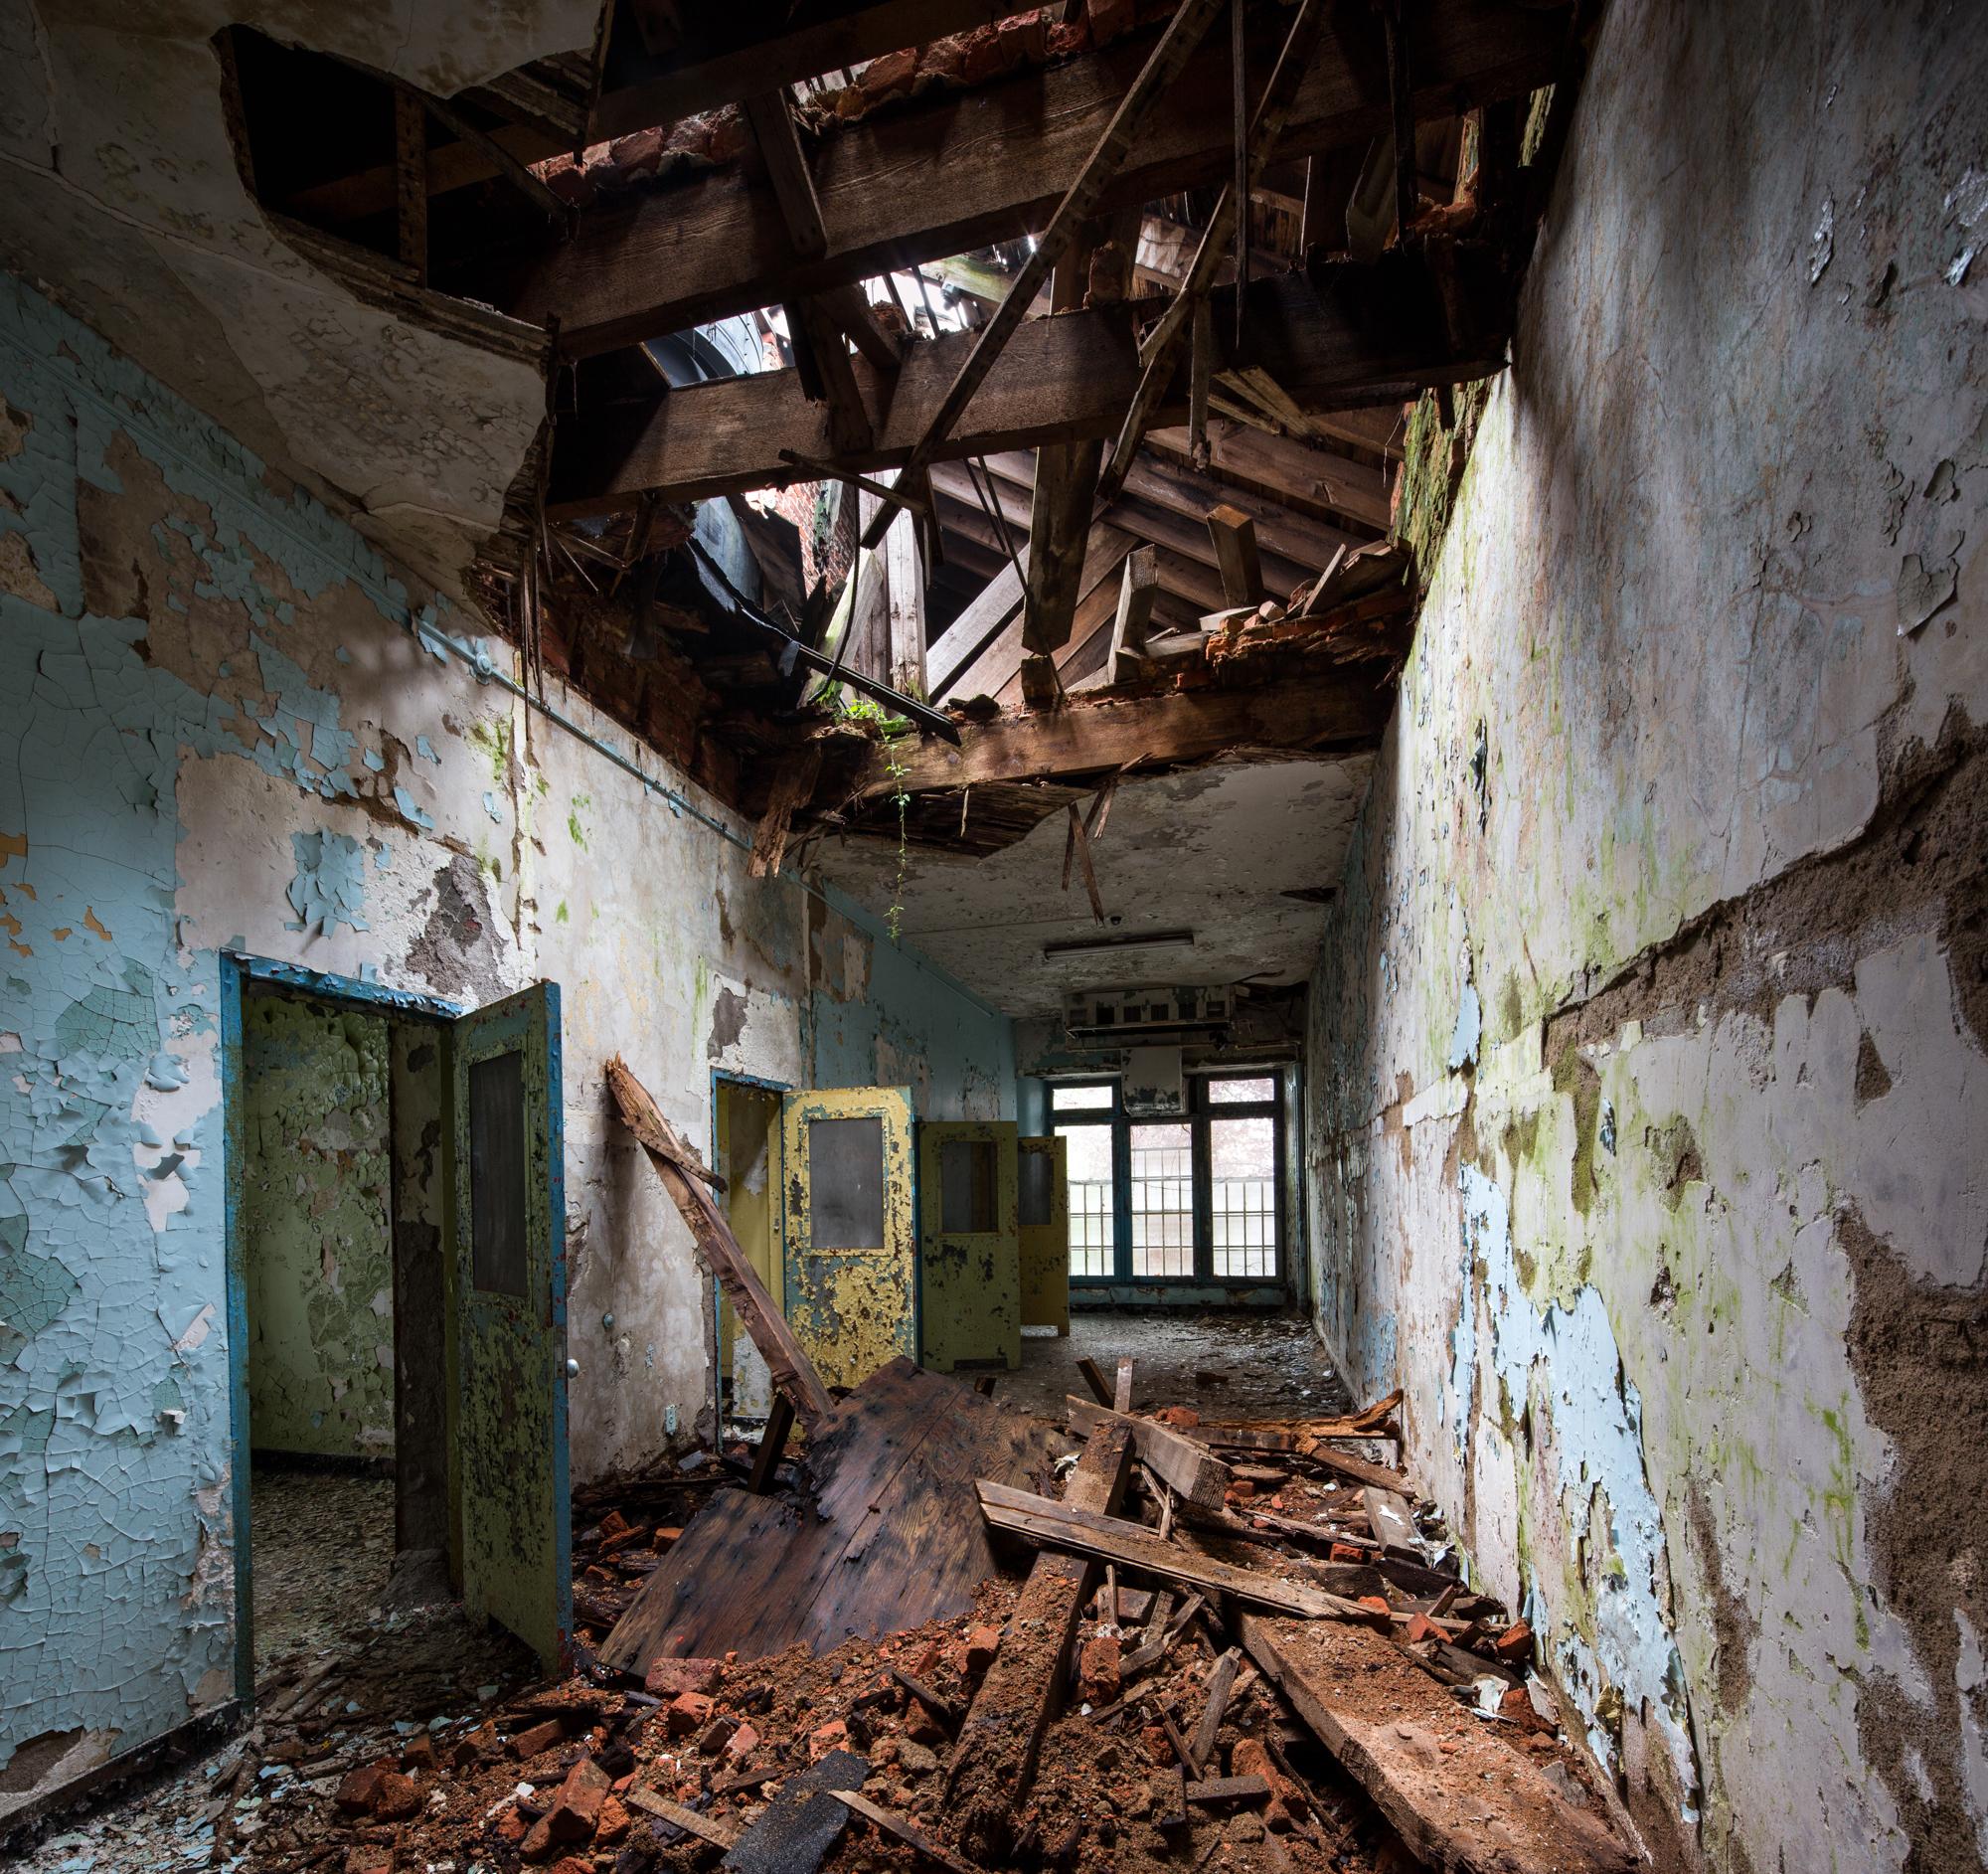 Female violent wards, Greystone Park Psychiatric Hospital - New Jersey